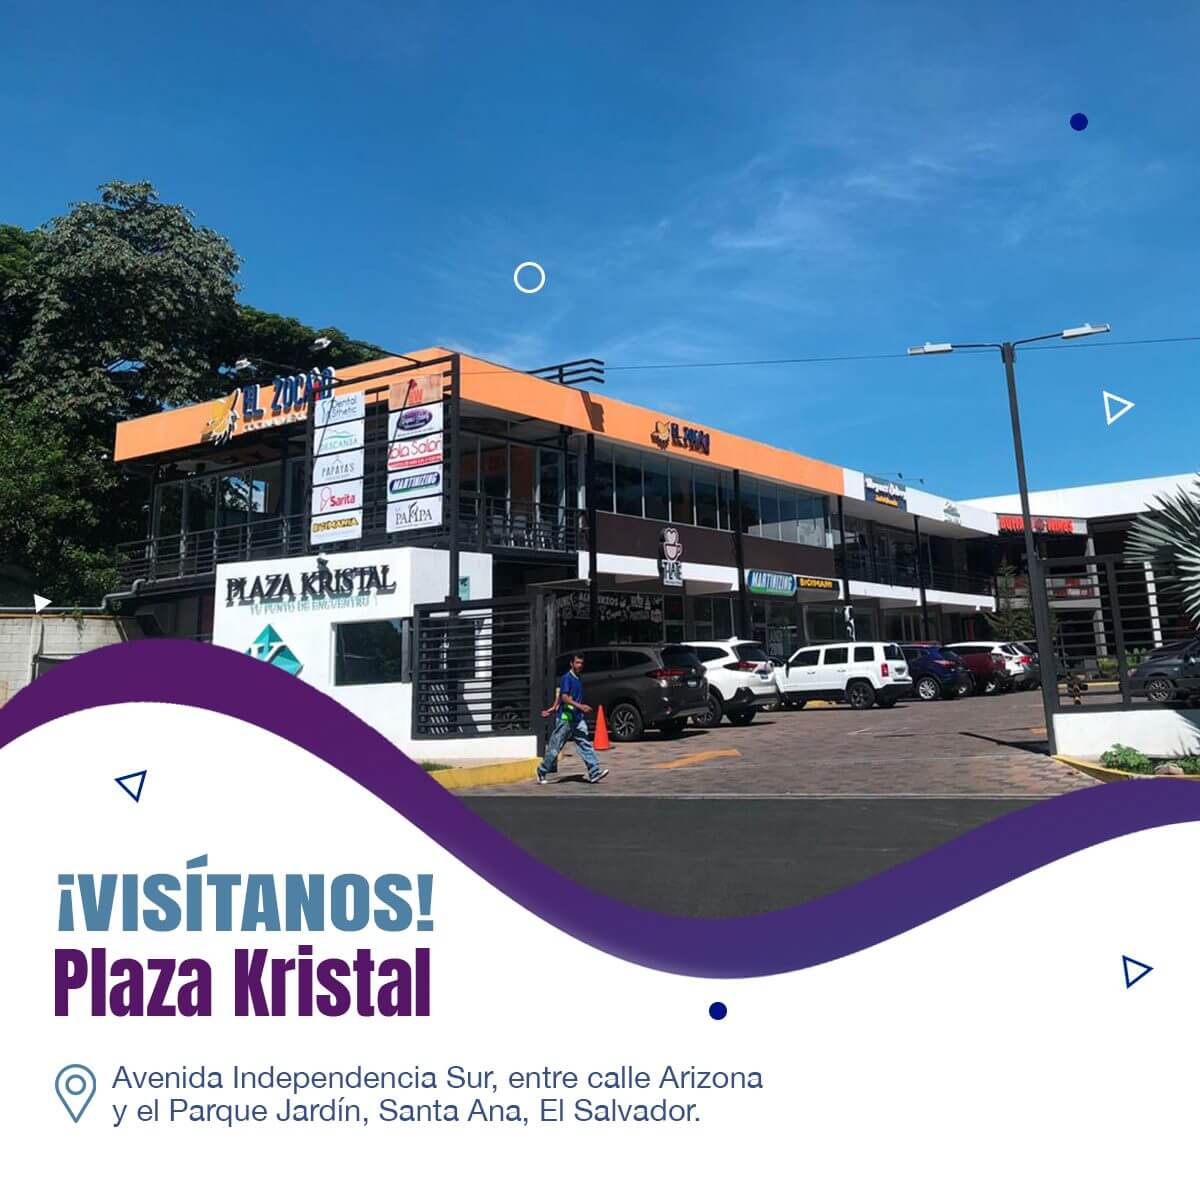 dental-esthetic-plaza-kristal-04